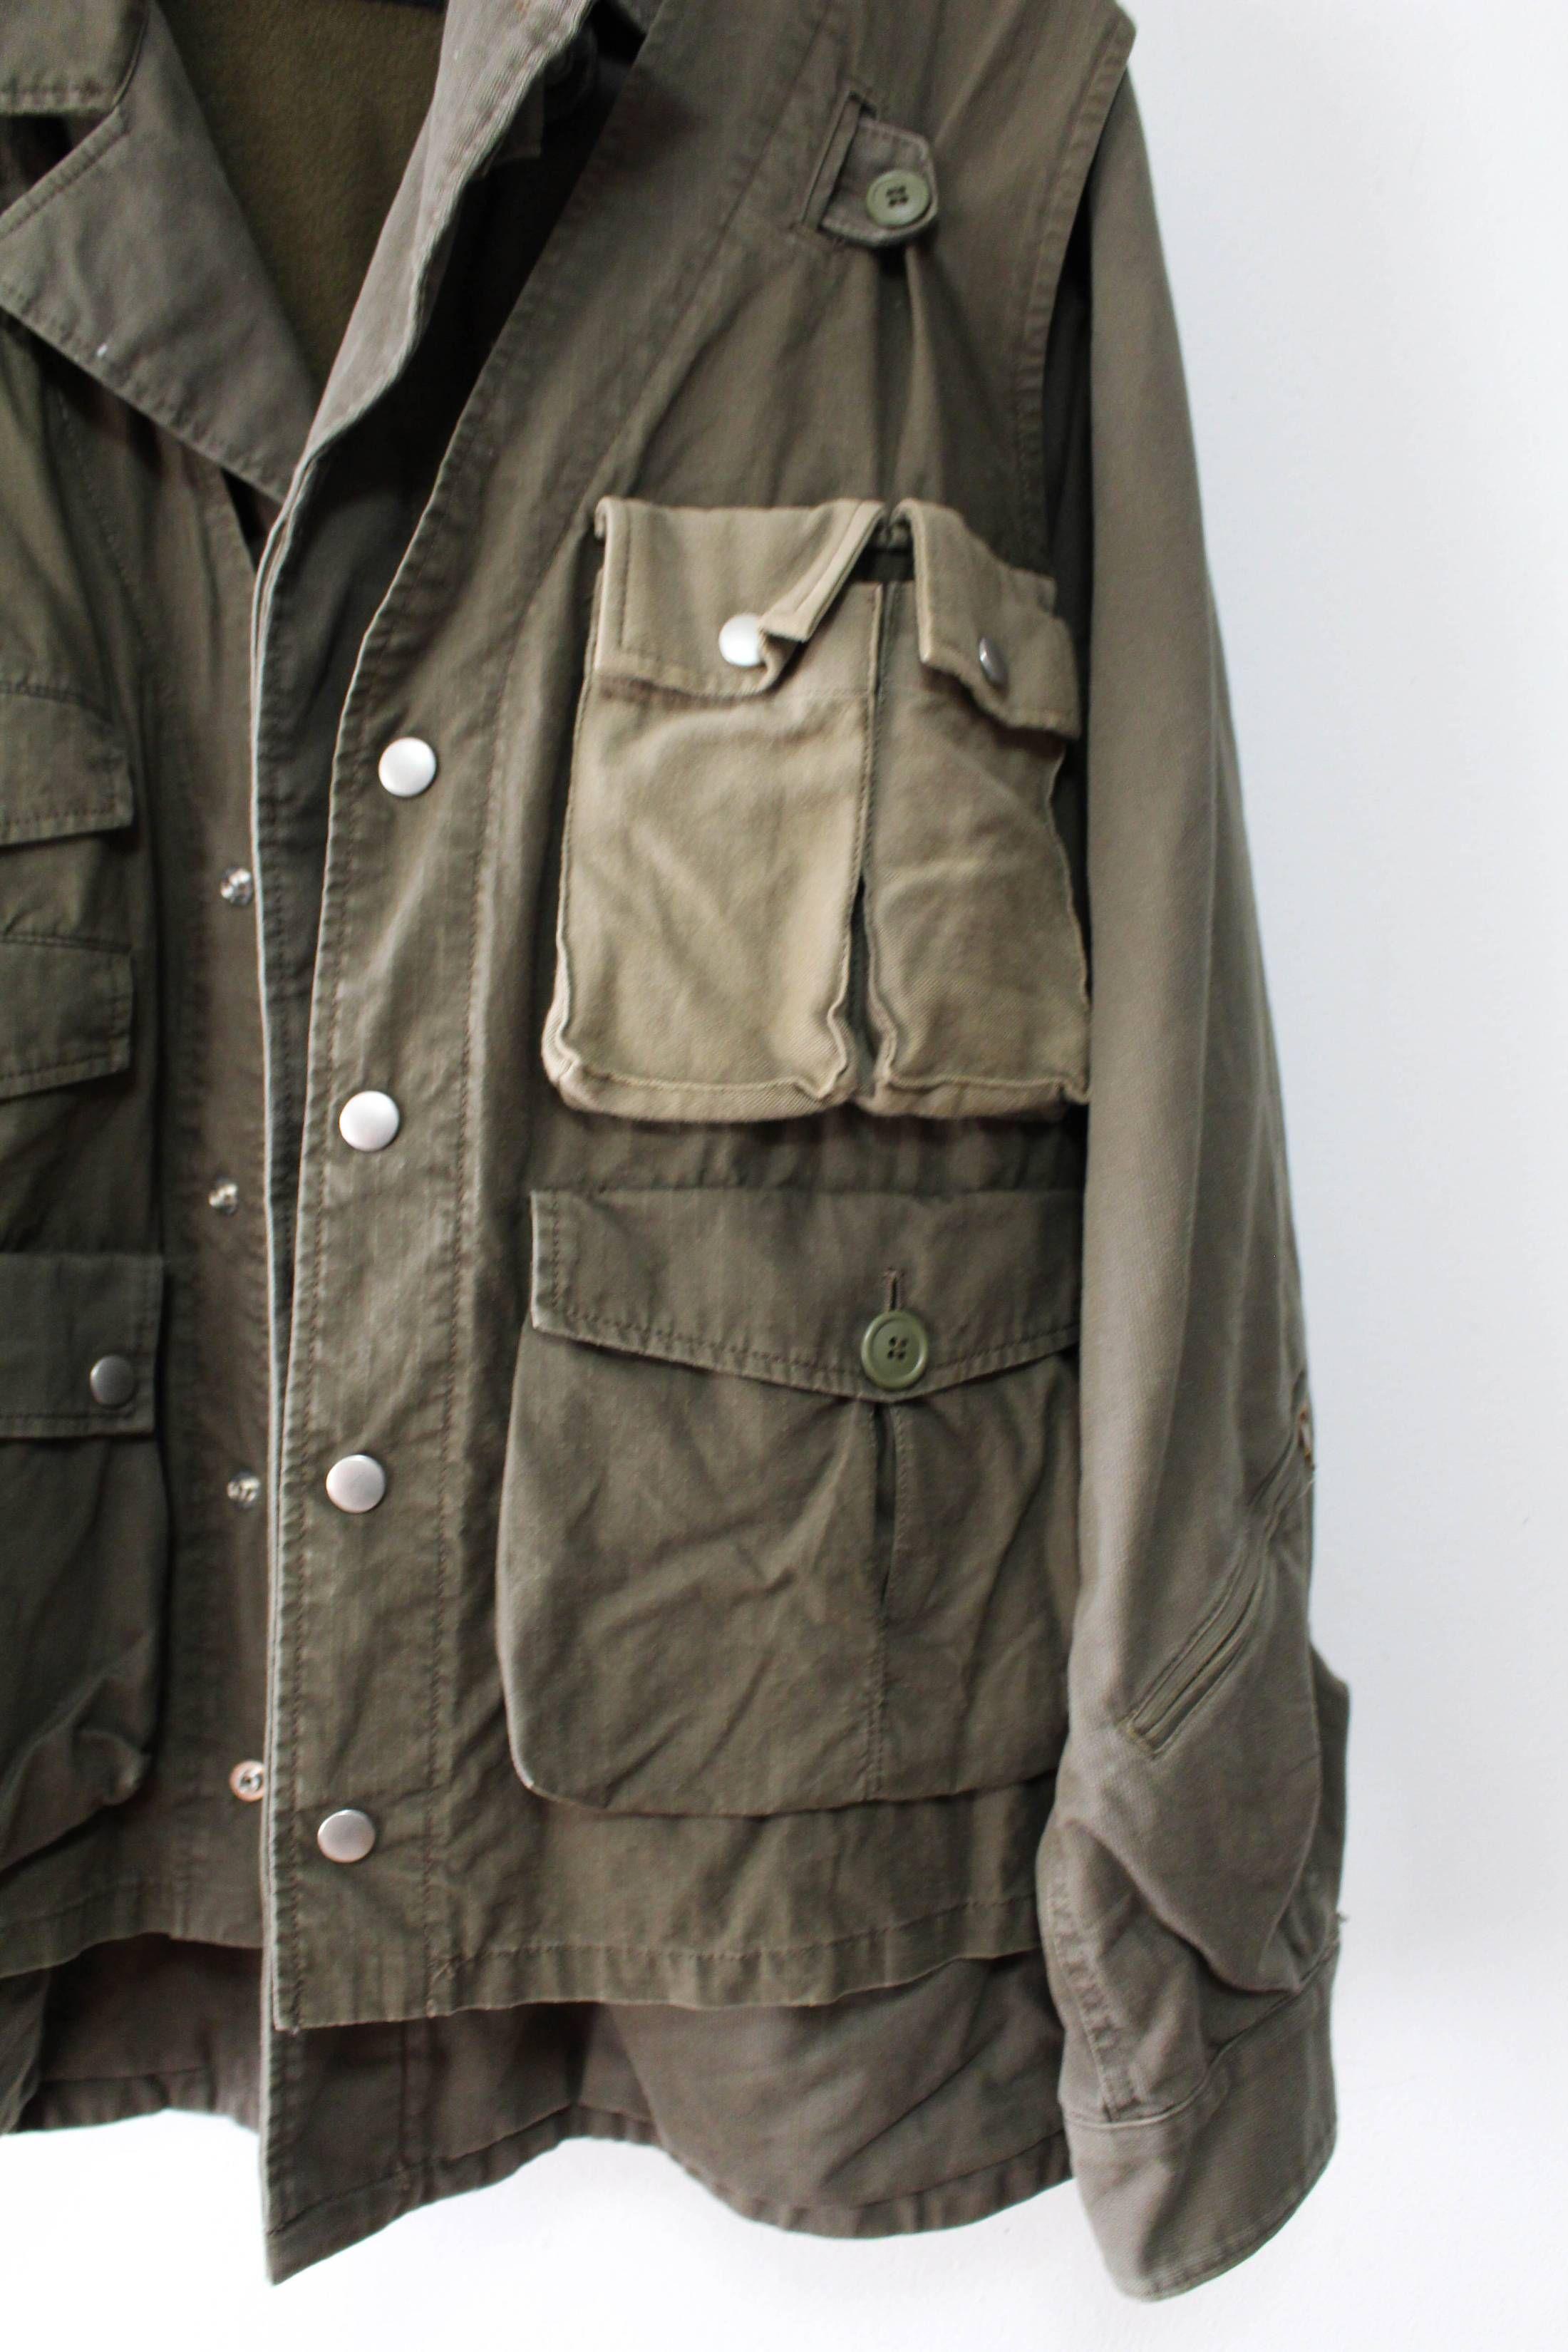 23b725ad40b Undercover M51 Field Military Jacket + Ripstop Utility Vest Size US L   EU  52-54   3 - 3